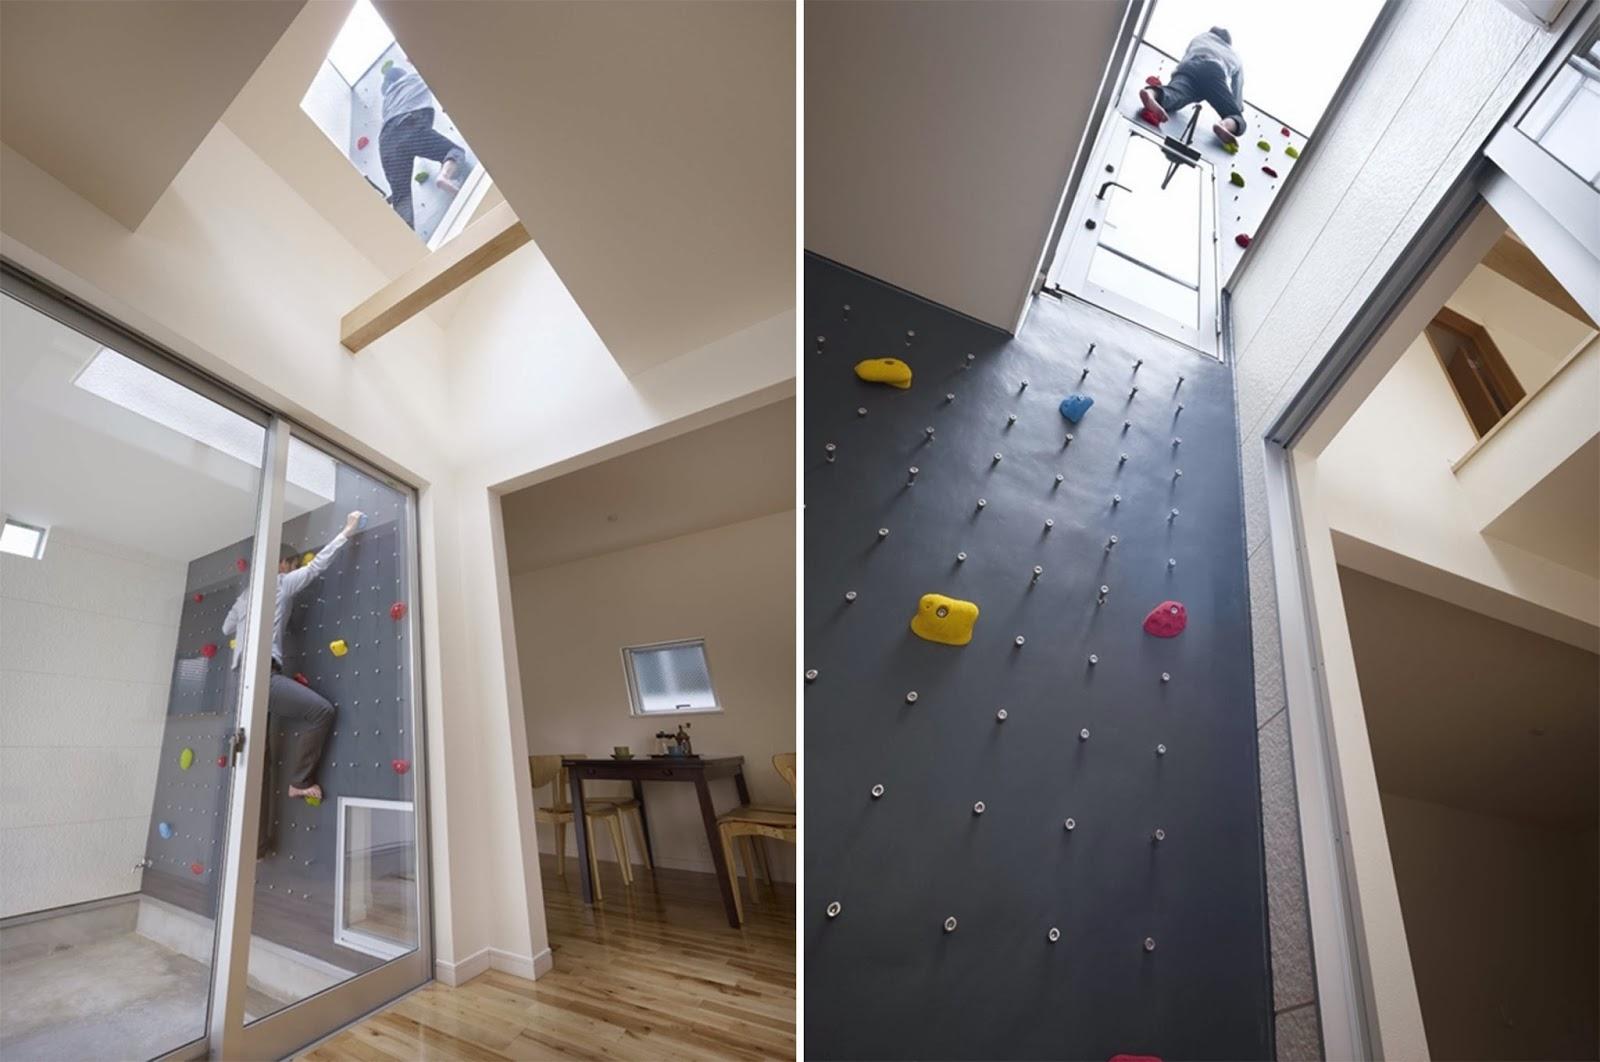 Altezza Minima Soffitto naf architect & design - 3way house con climbing wall   arc